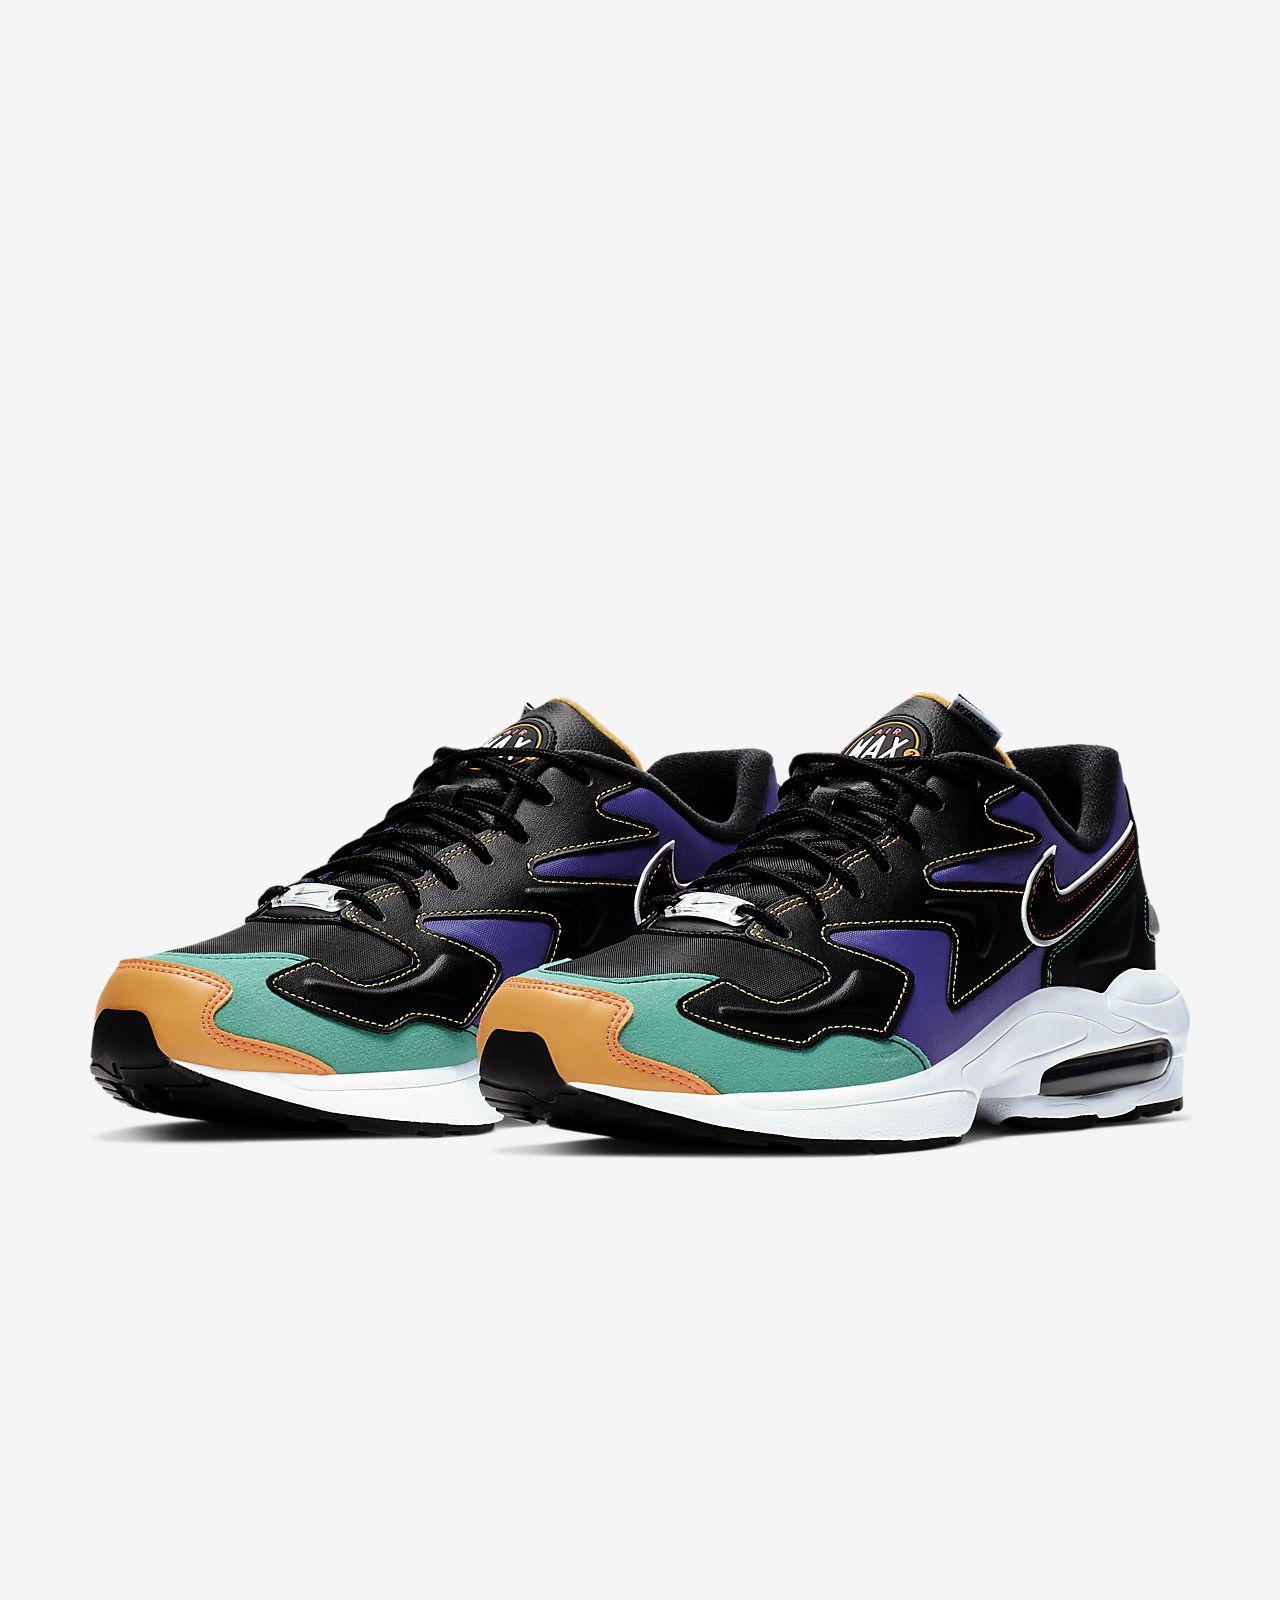 Chaussure Nike Air Max2 Light Premium pour Homme